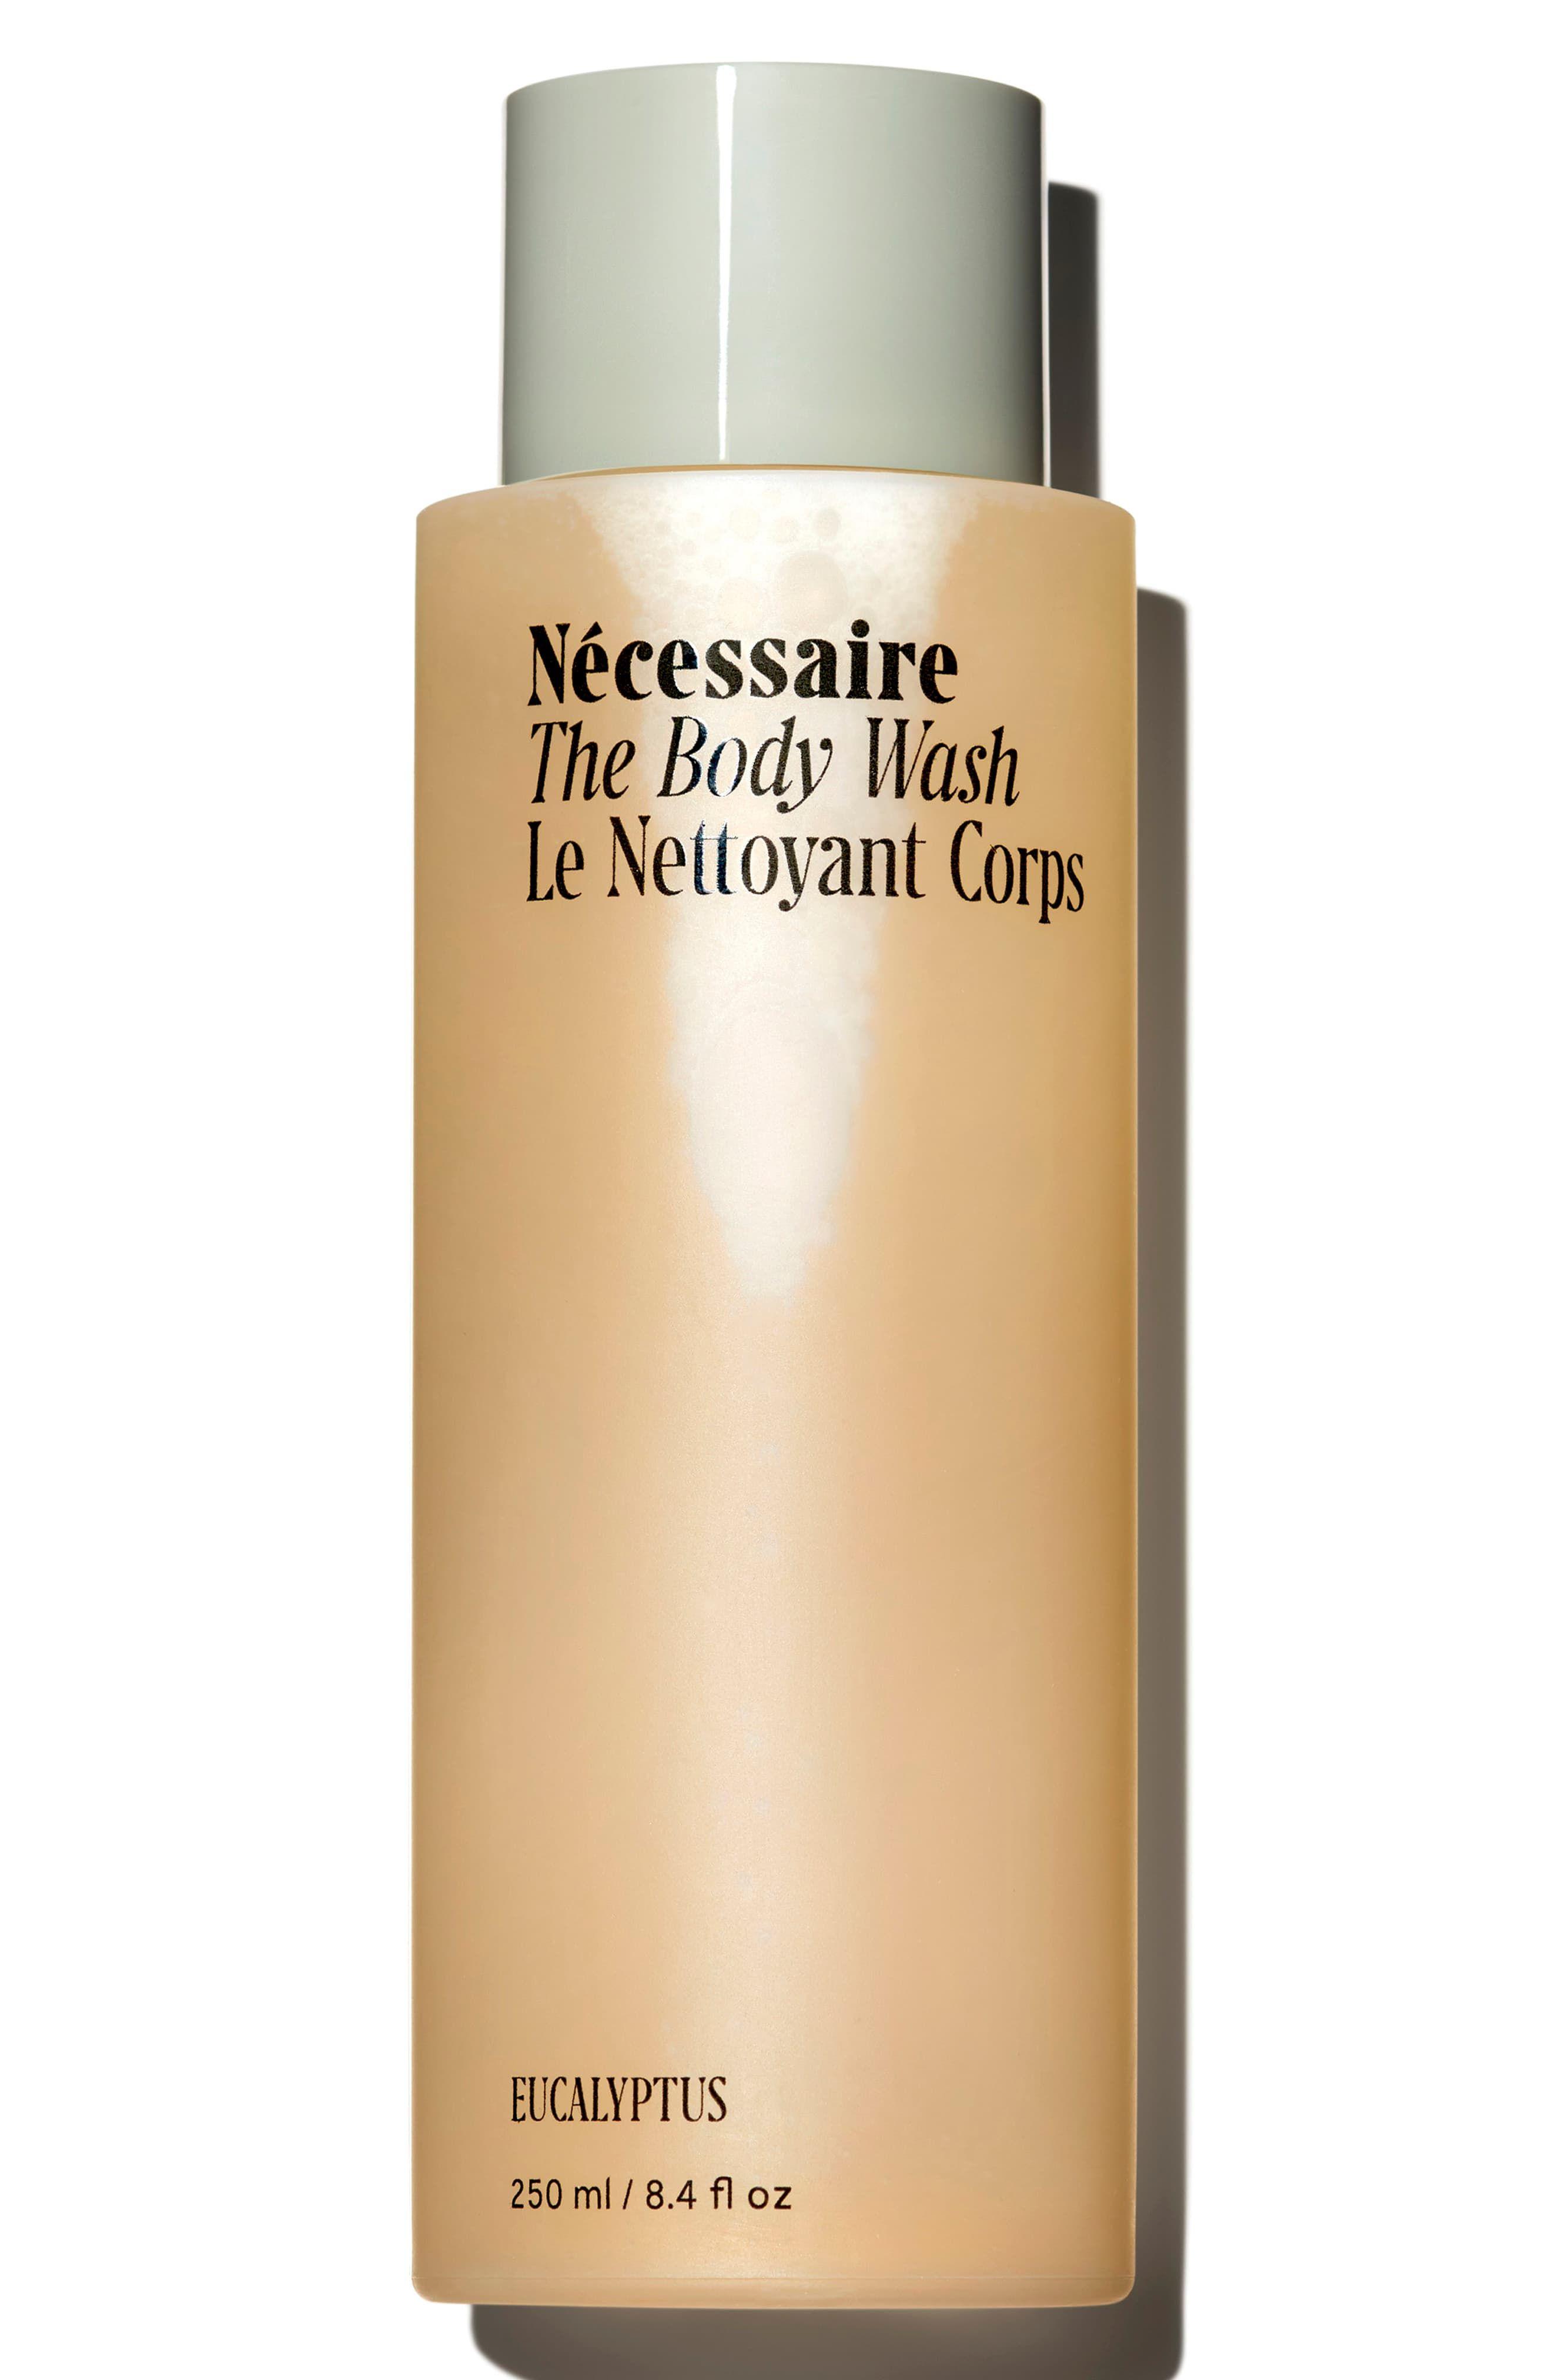 Nécessaire The Body Wash Body wash, Best moisturizer